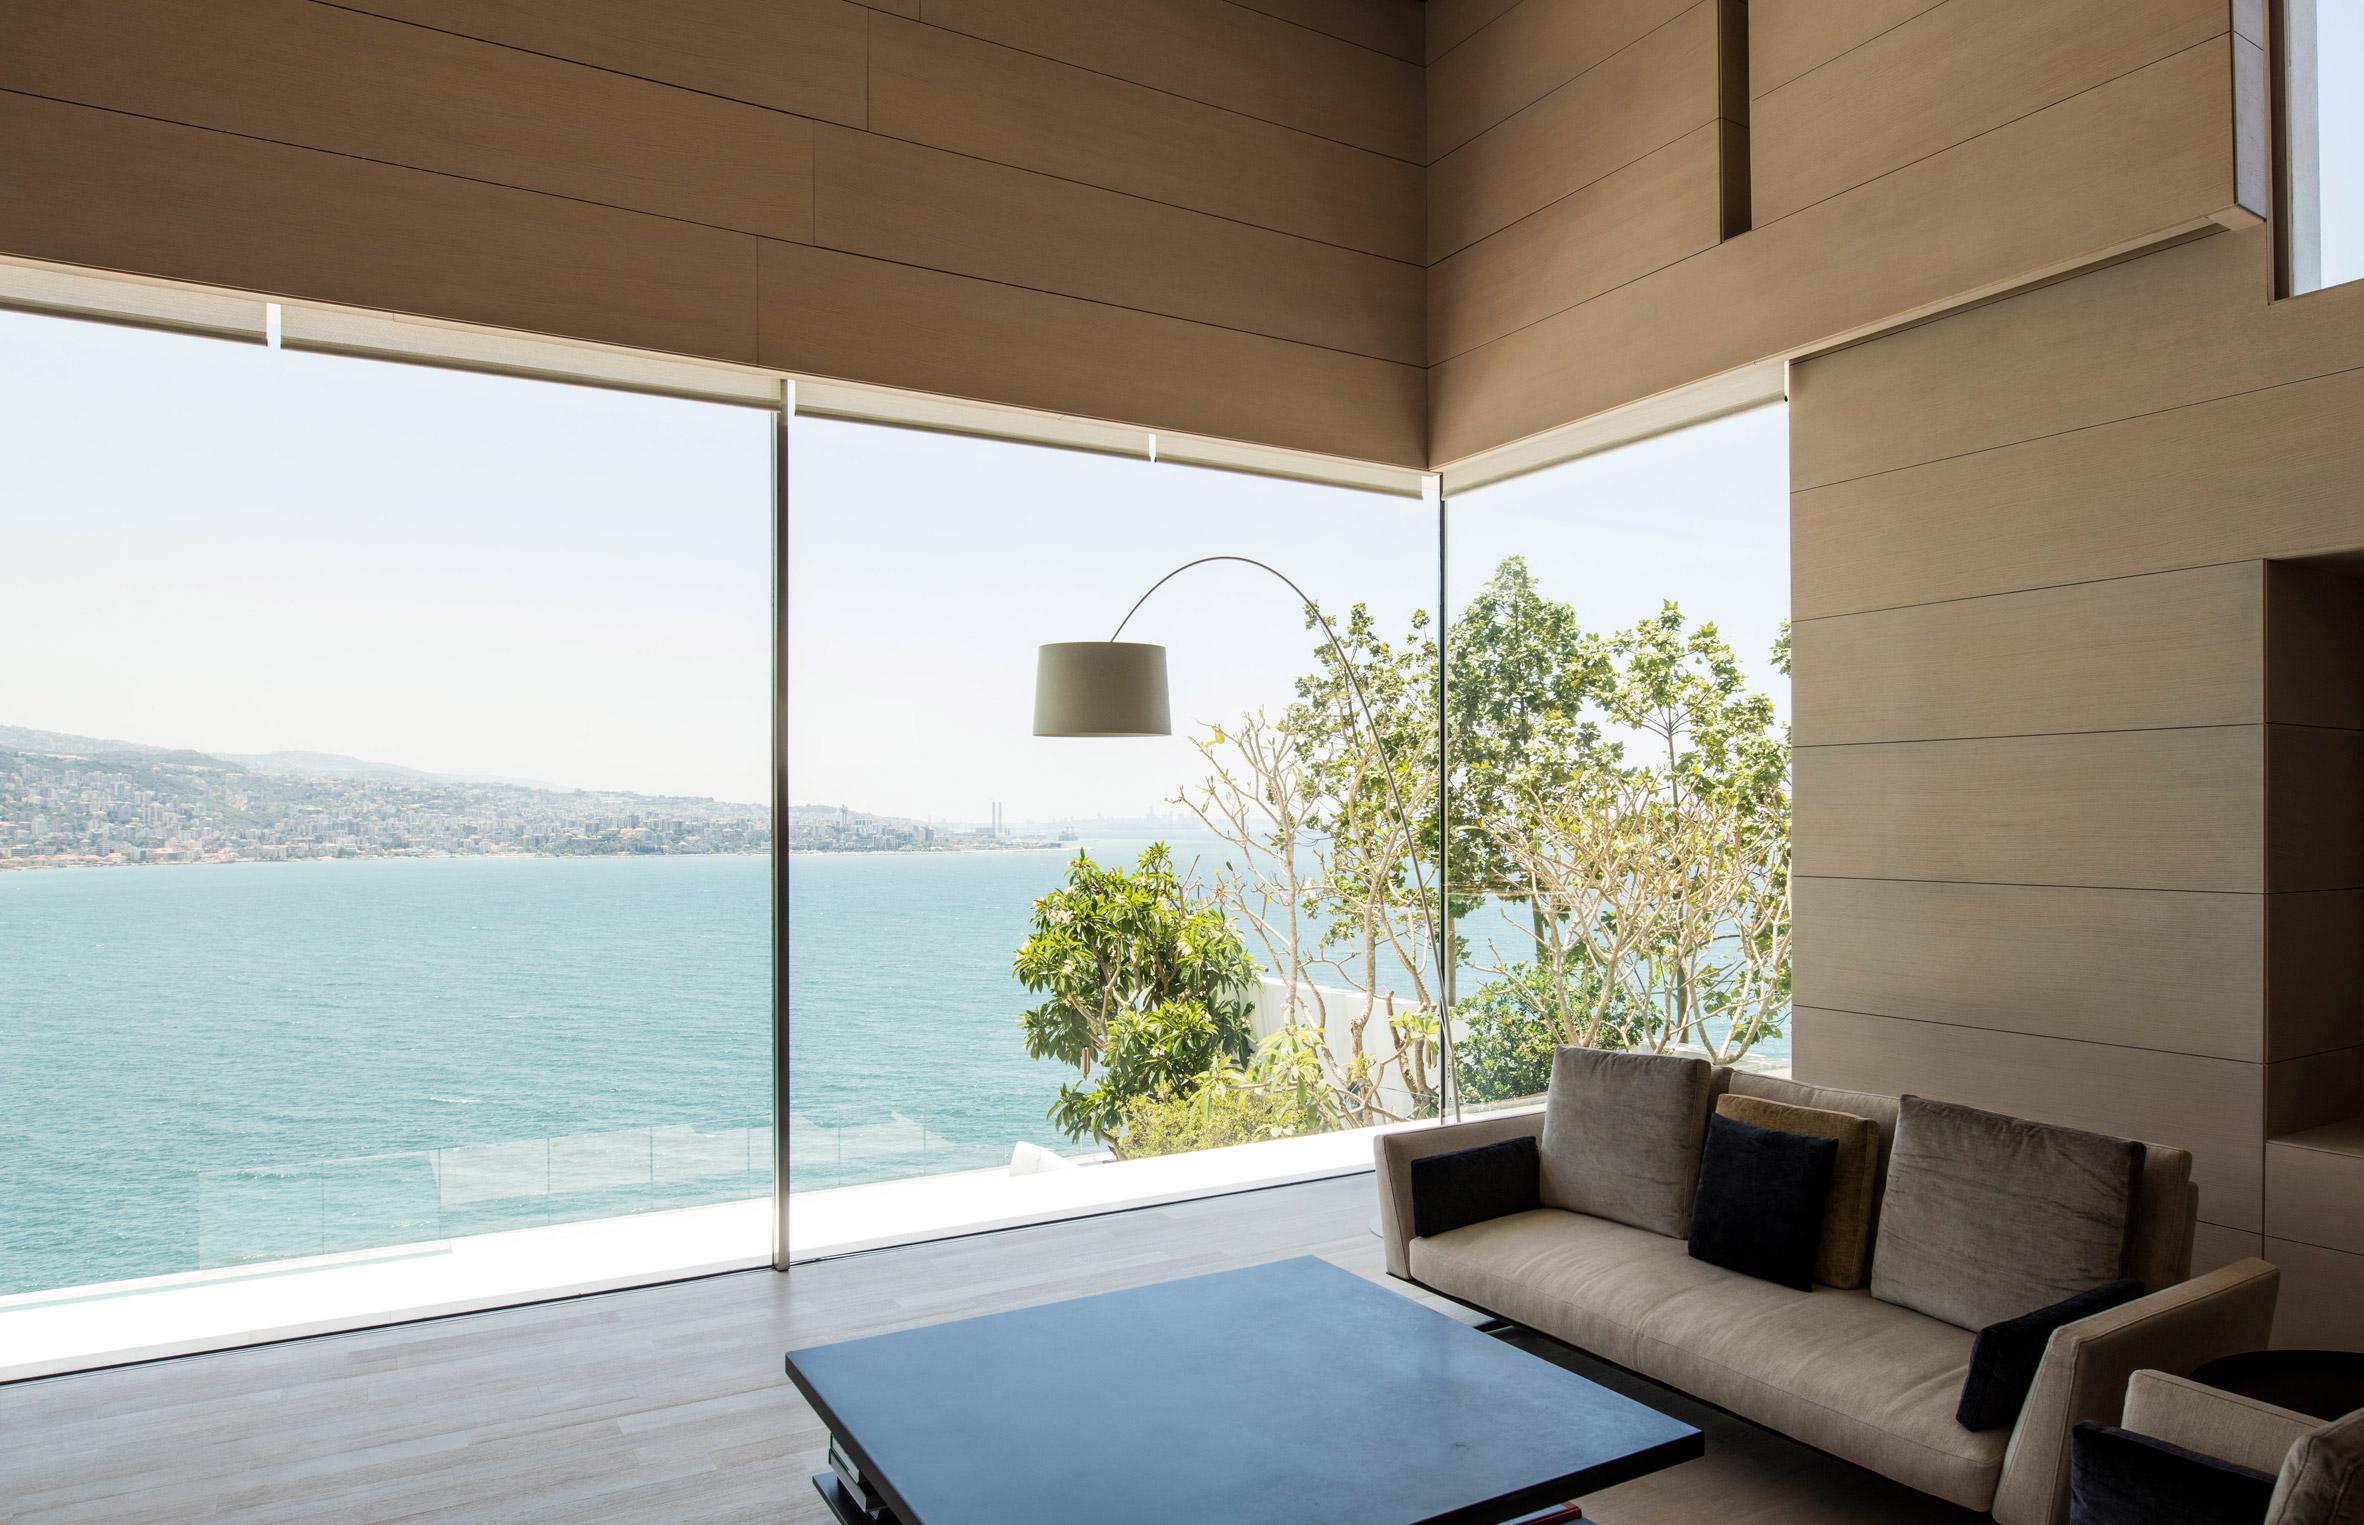 Vitrocsa offers floor-to-ceiling glazing that slides open around corners